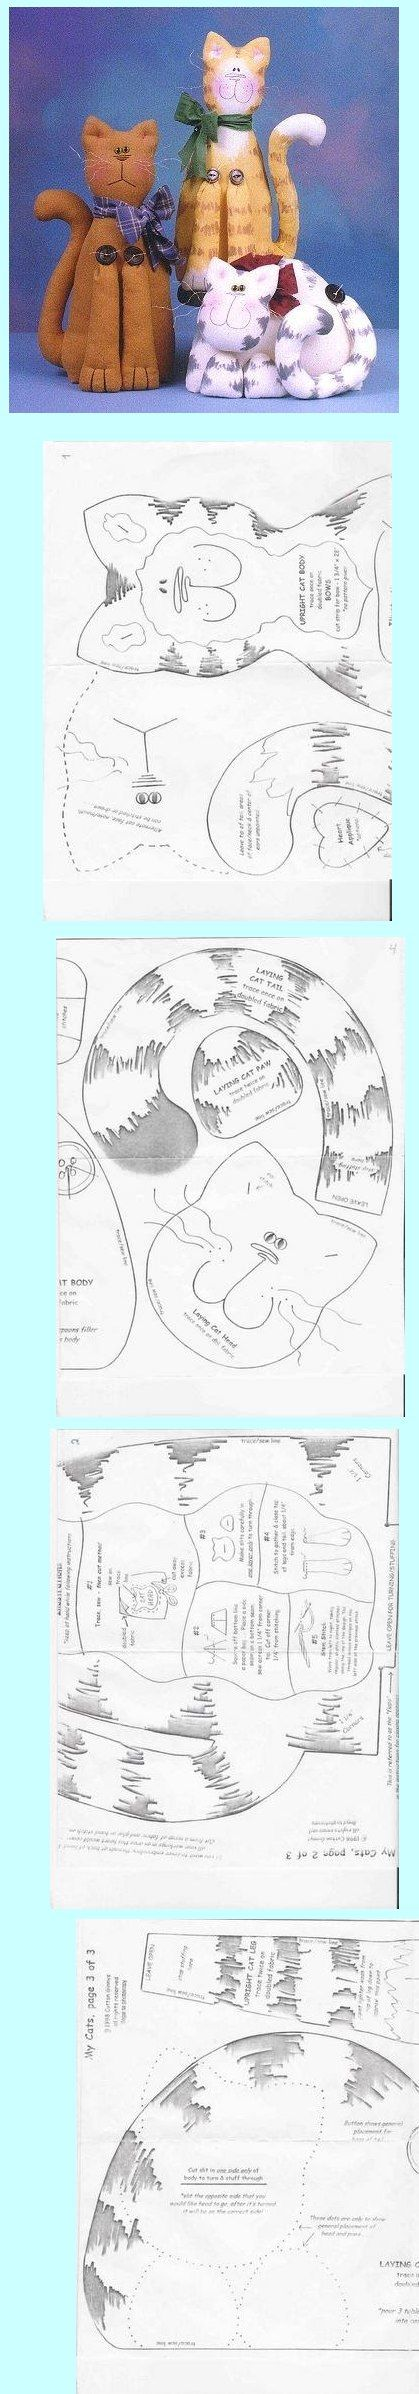 Pin de Kelly Zago en ideias em feltro   Pinterest   Gato, Molde y ...